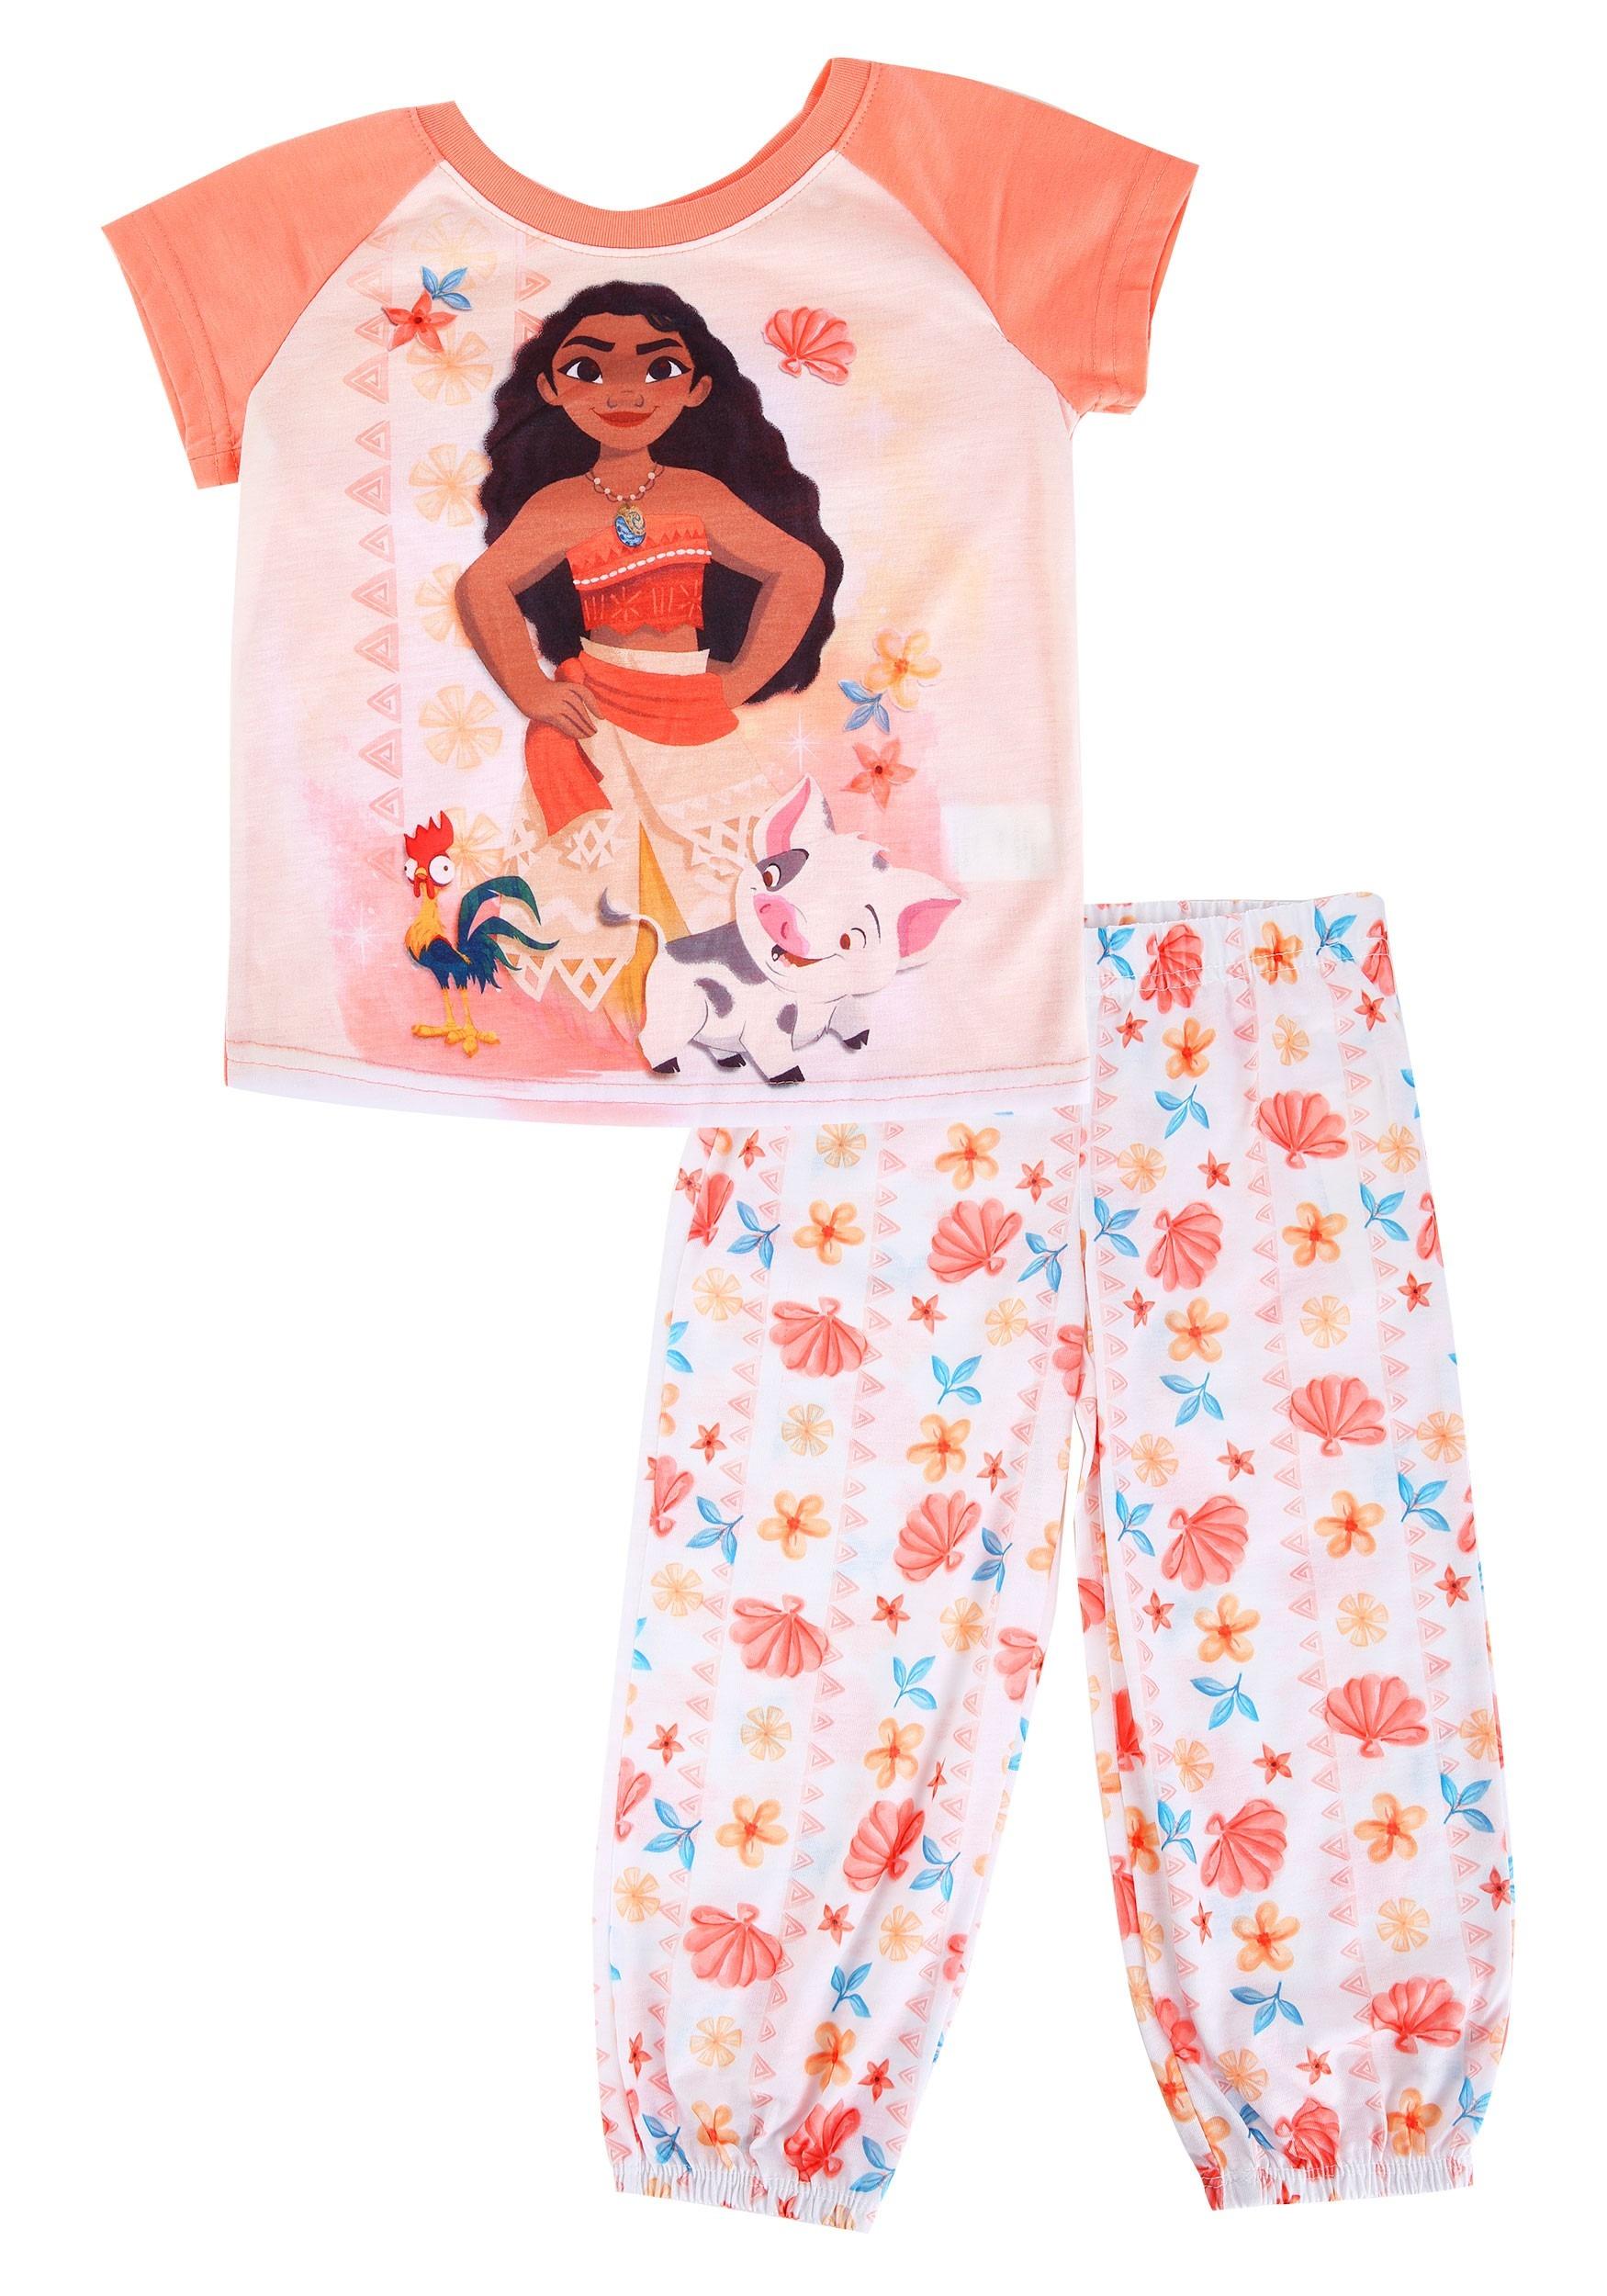 Moana_Shirt_Pant_Sleep_Set_for_Girls